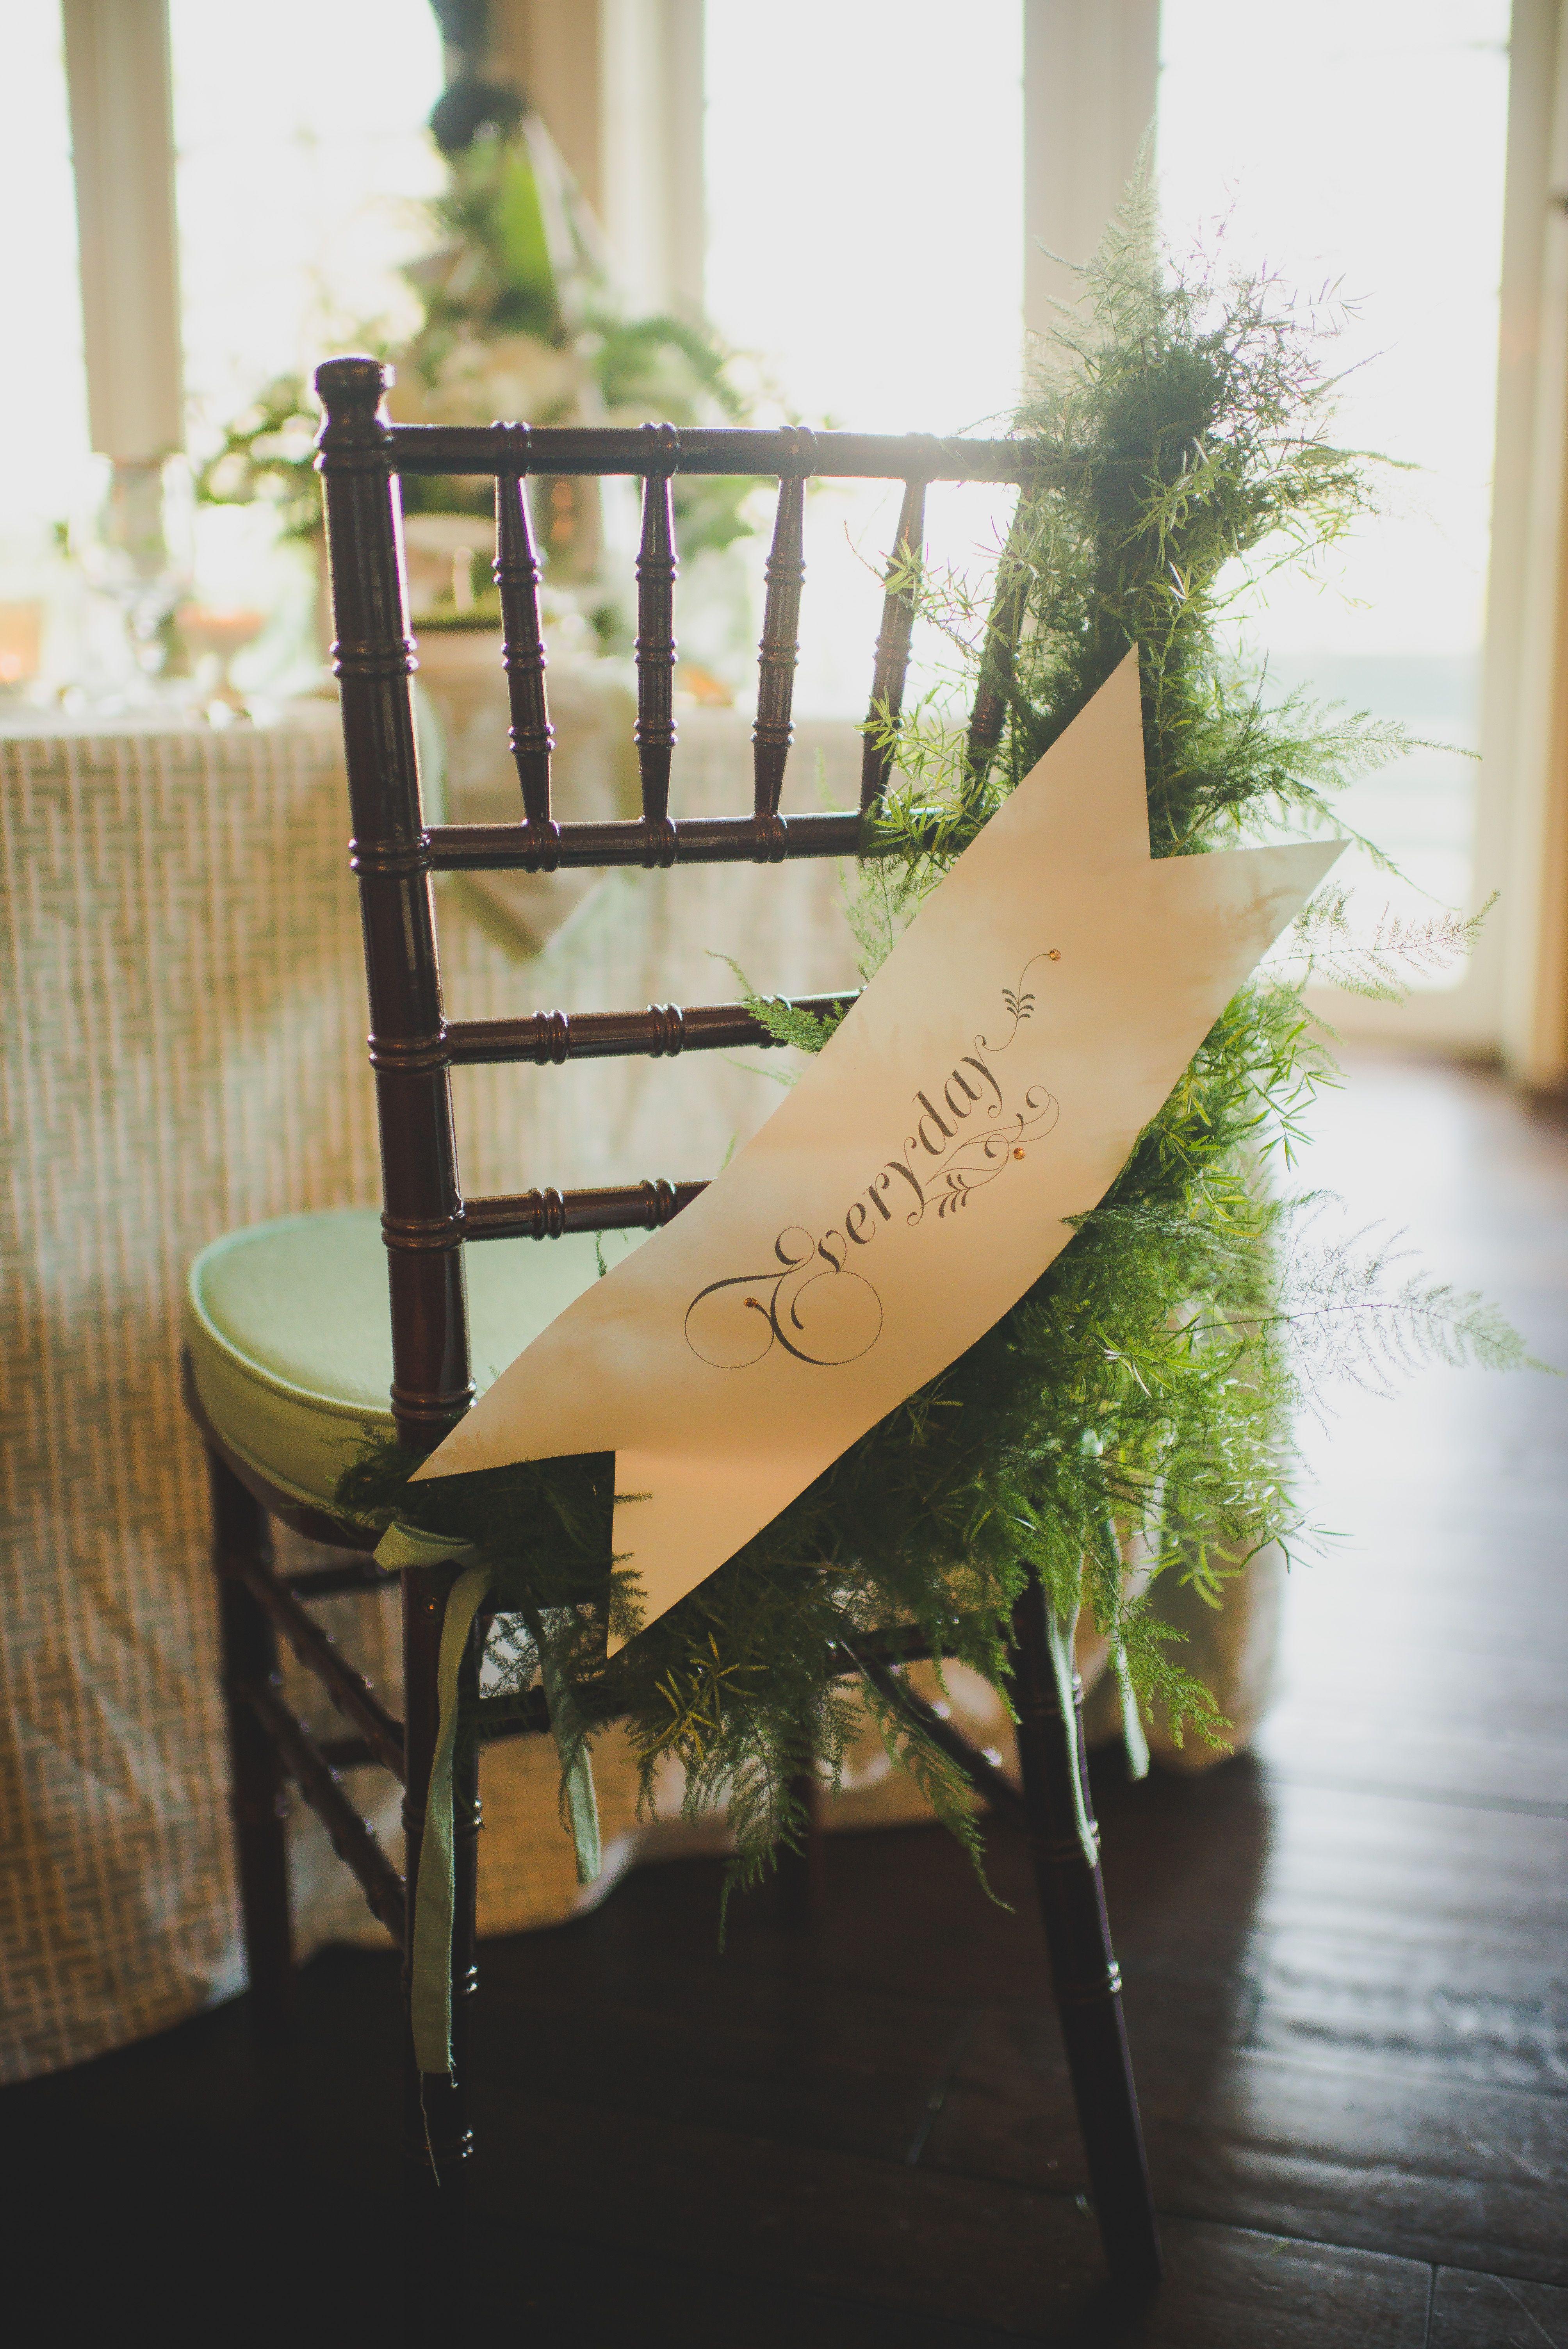 rental unique chairs chair party event rivera a for miami rentals chiavari wedding